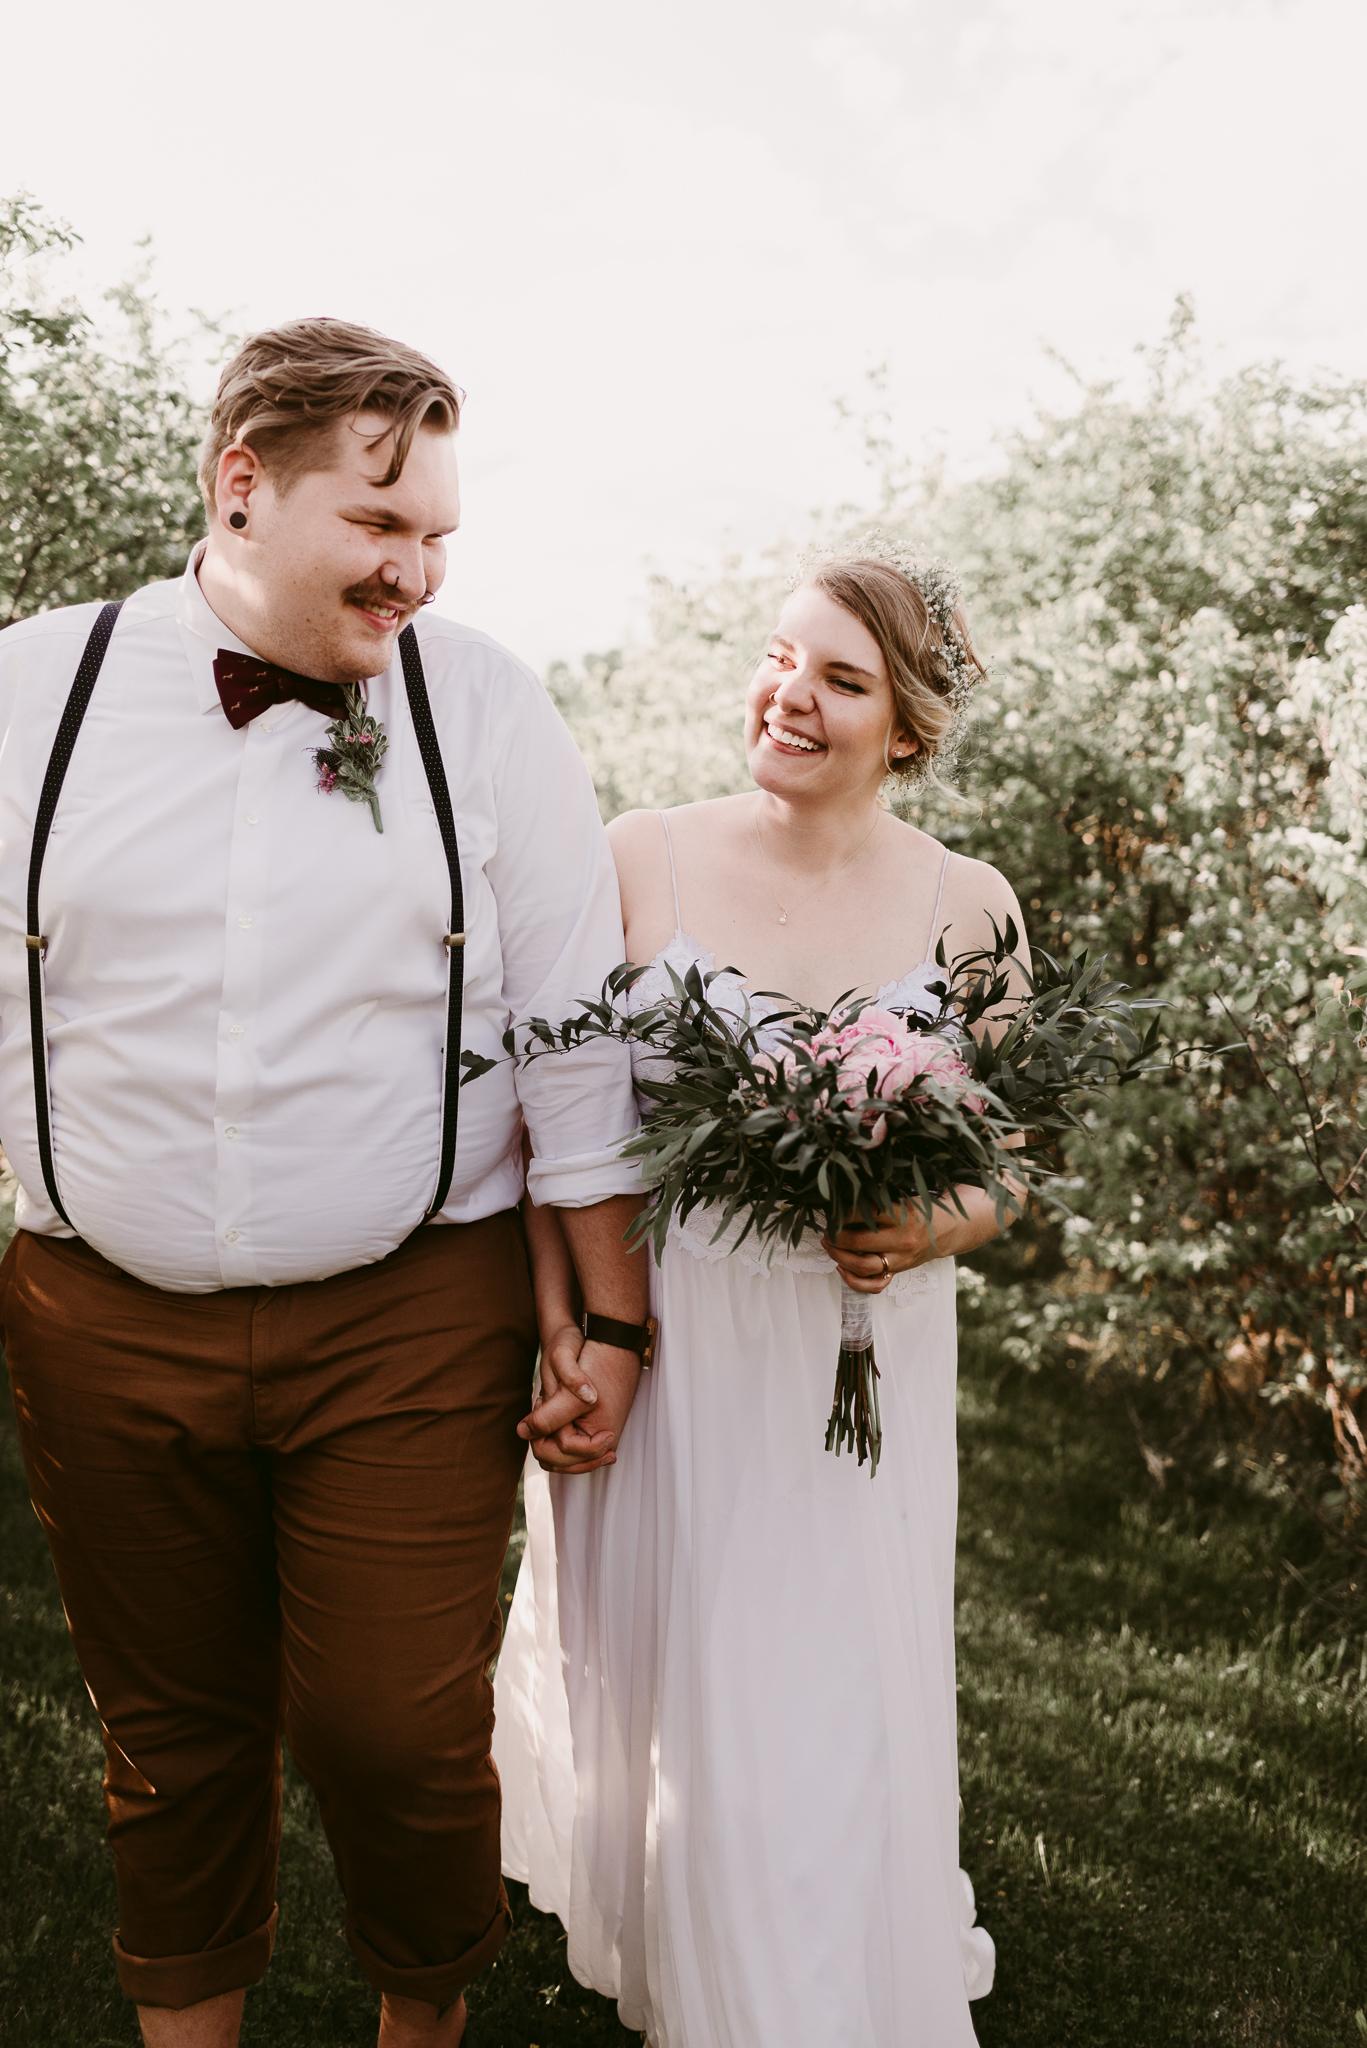 D&P-weddingblog-228.jpg